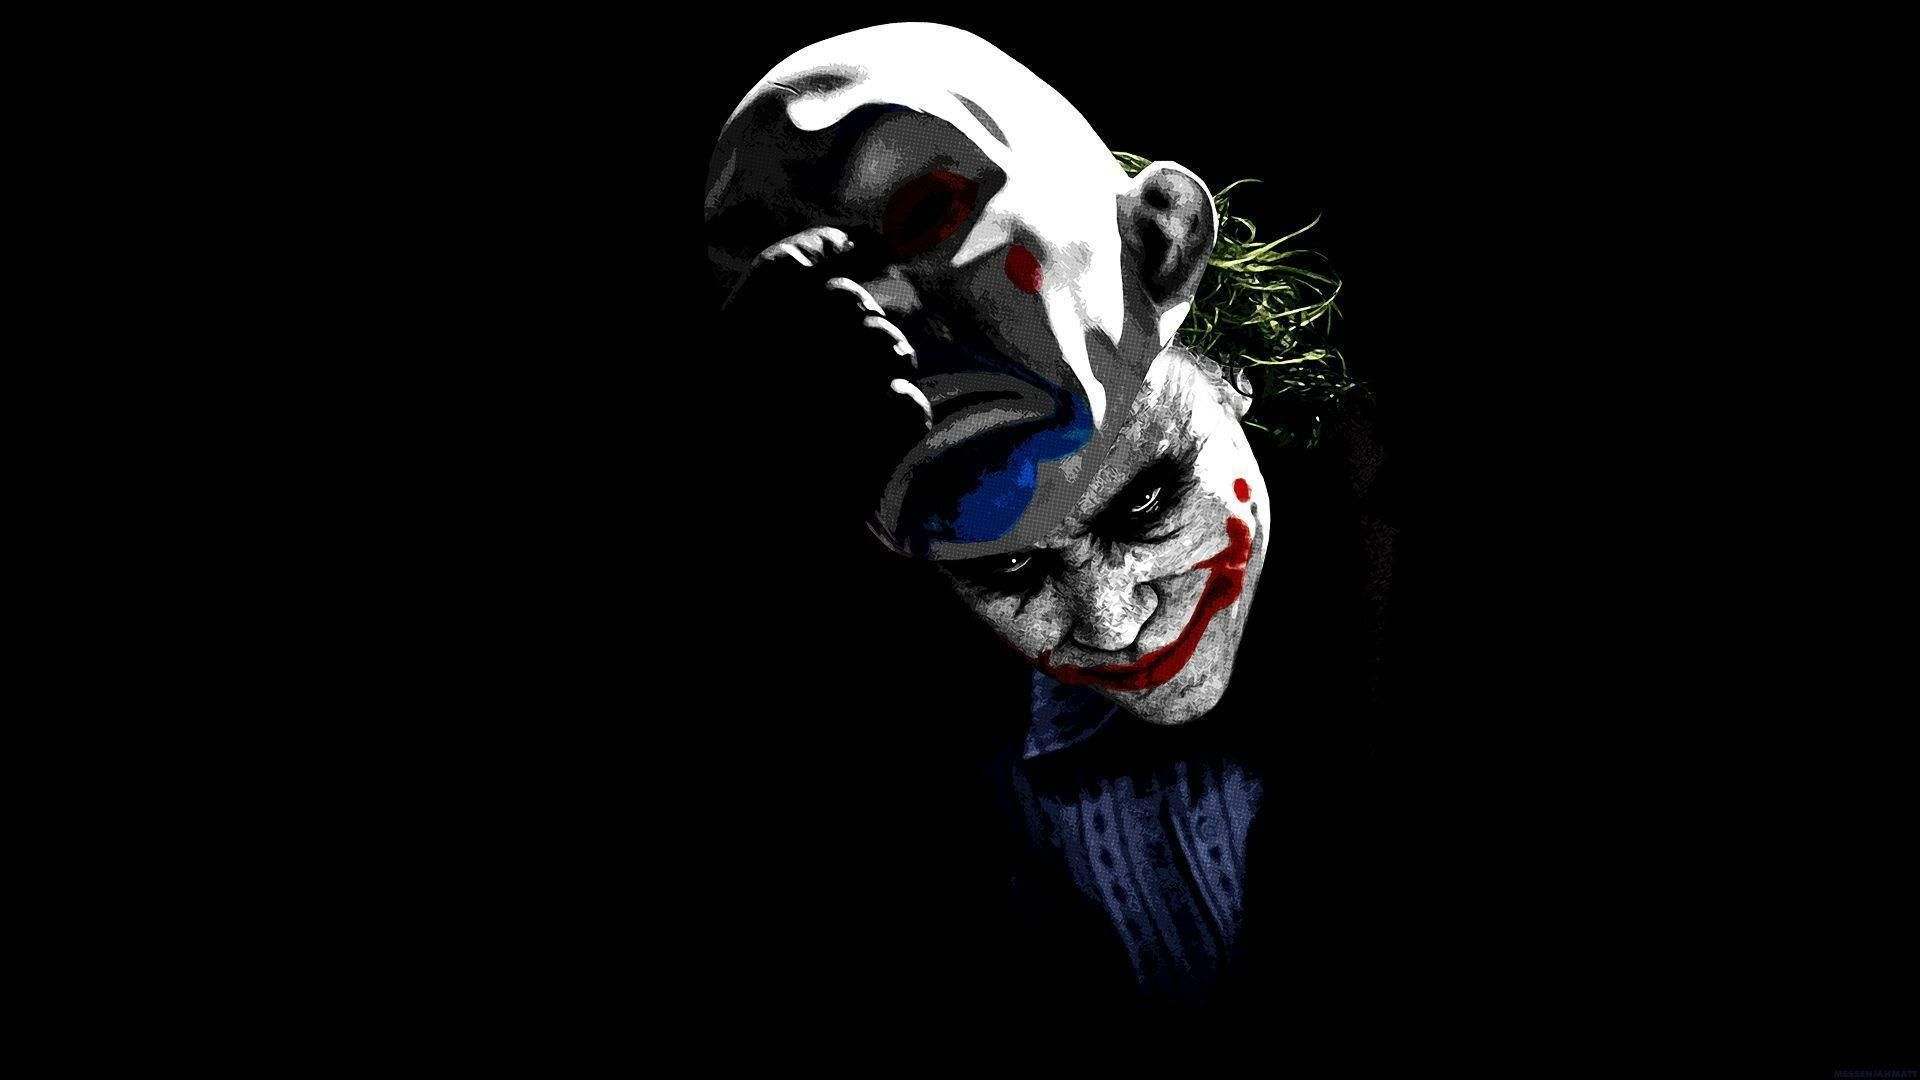 The Joker 1920x1080 Pc Desktop Wallpaper Joker Iphone Wallpaper Dark Knight Wallpaper